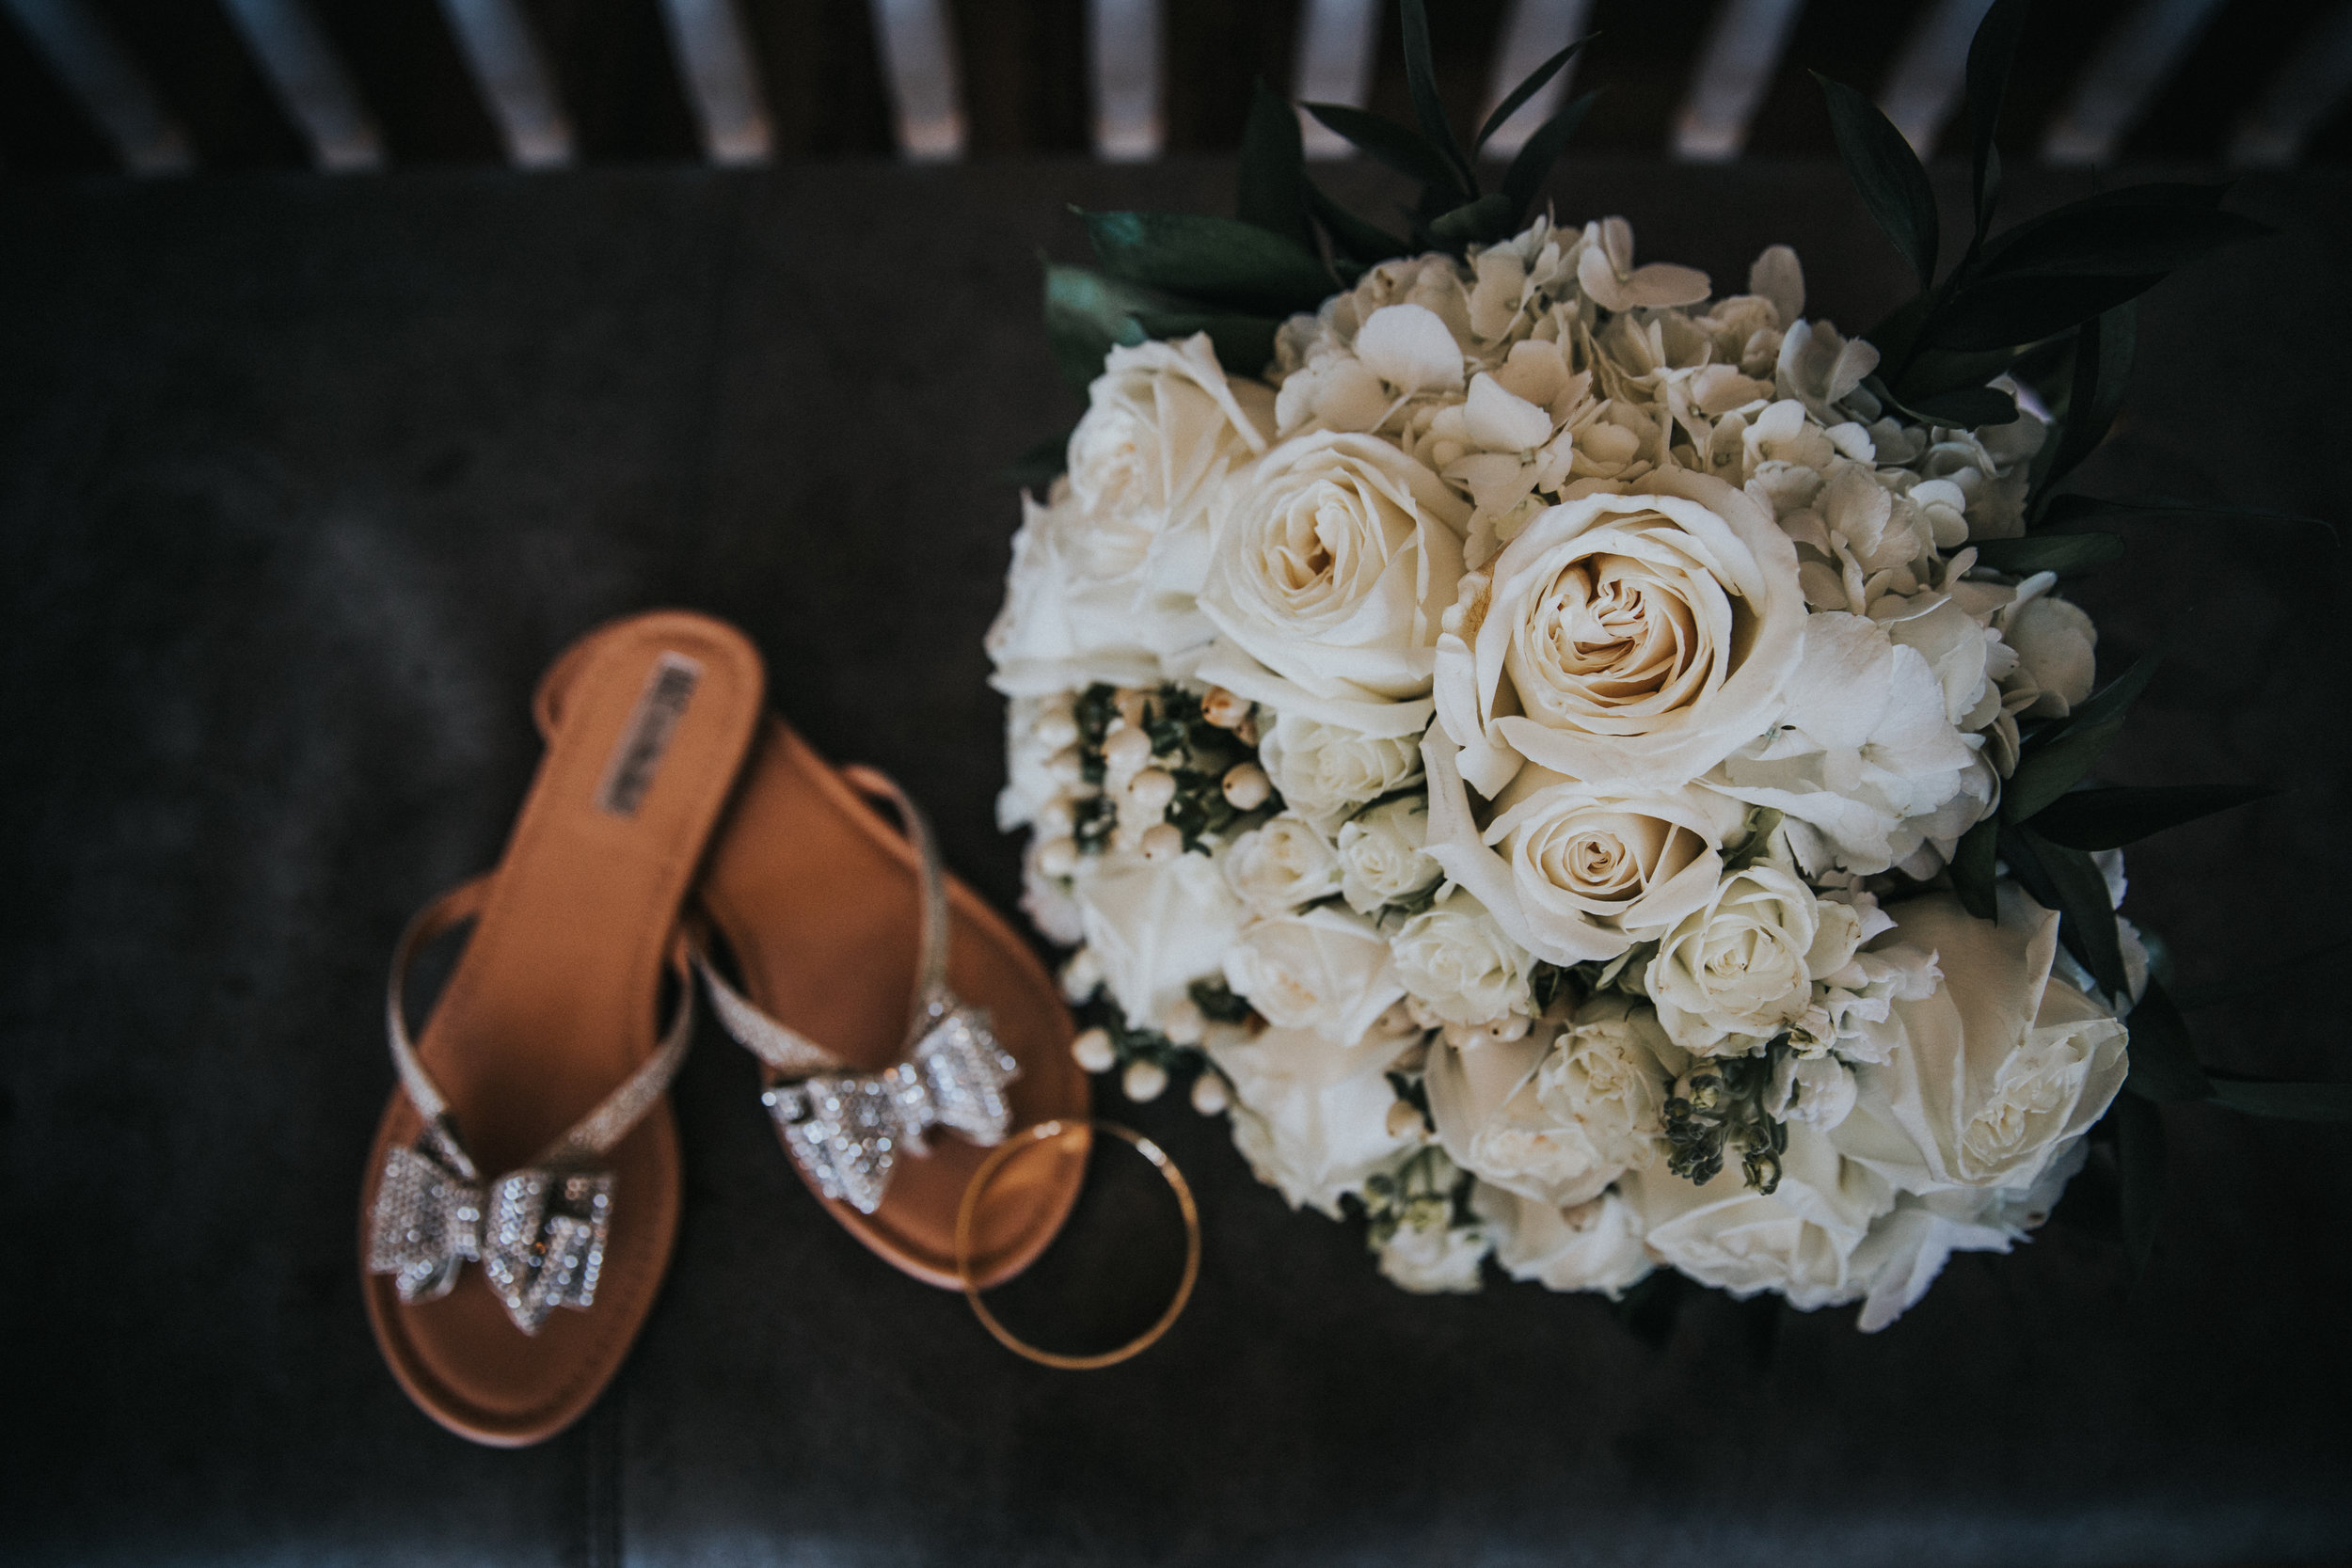 JennaLynnPhotography-NJWeddingPhotographer-Wedding-TheBerkeley-AsburyPark-Allison&Michael-Details-9.jpg